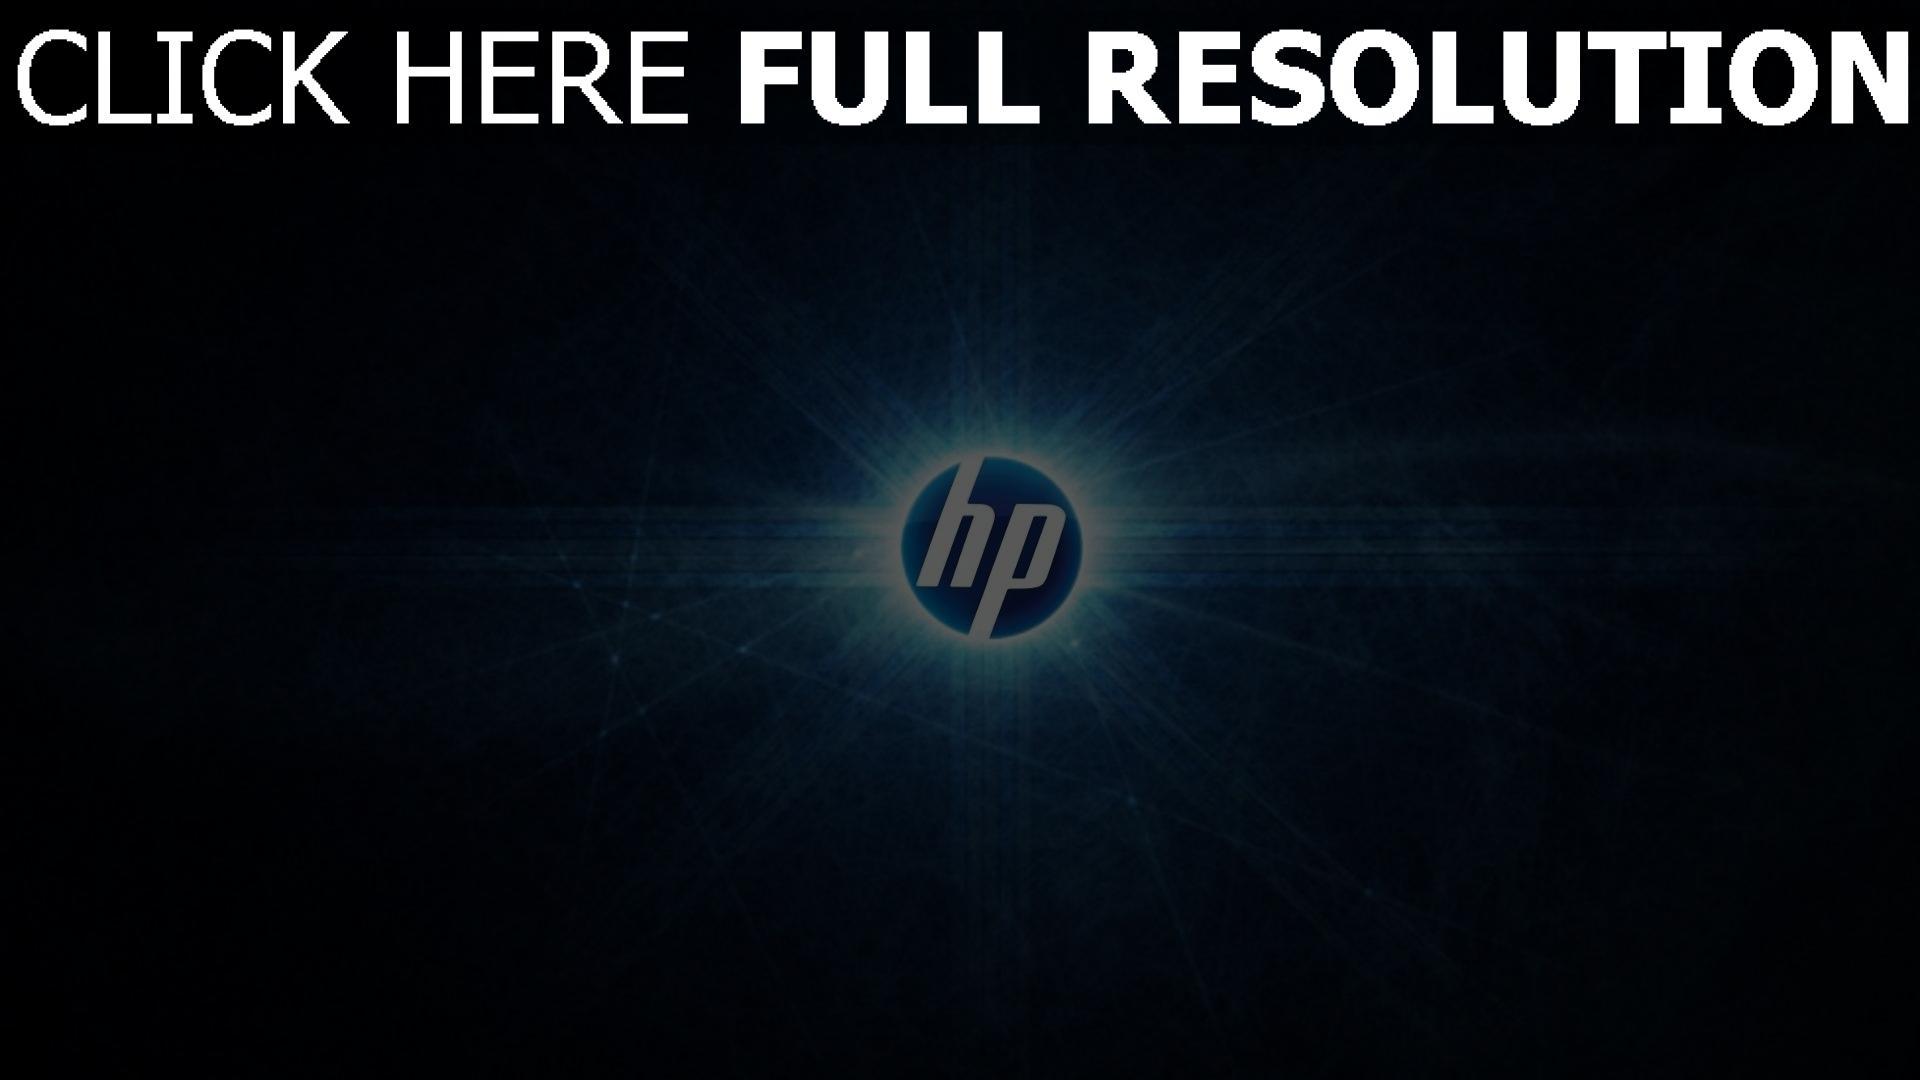 hd hintergrundbilder hp logo emblem blau abstrakt desktop